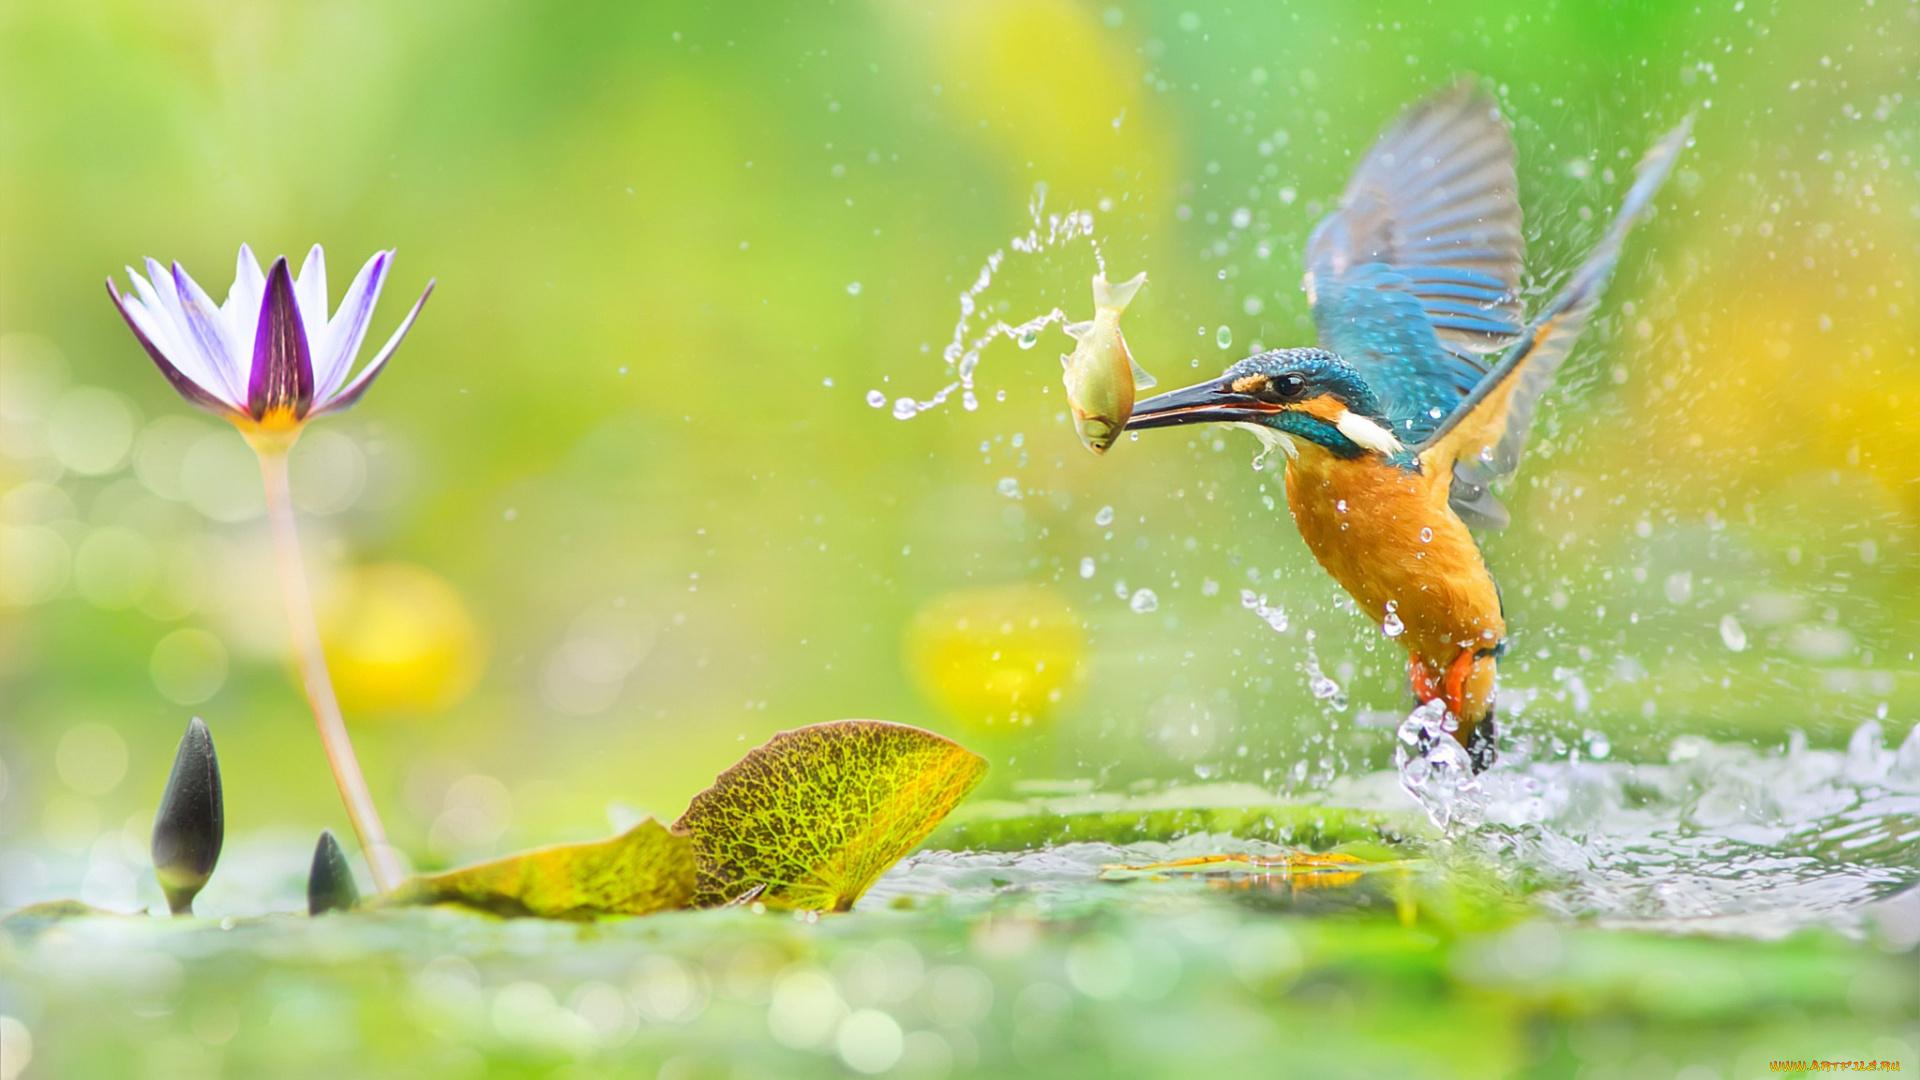 птица рыба брызги без регистрации